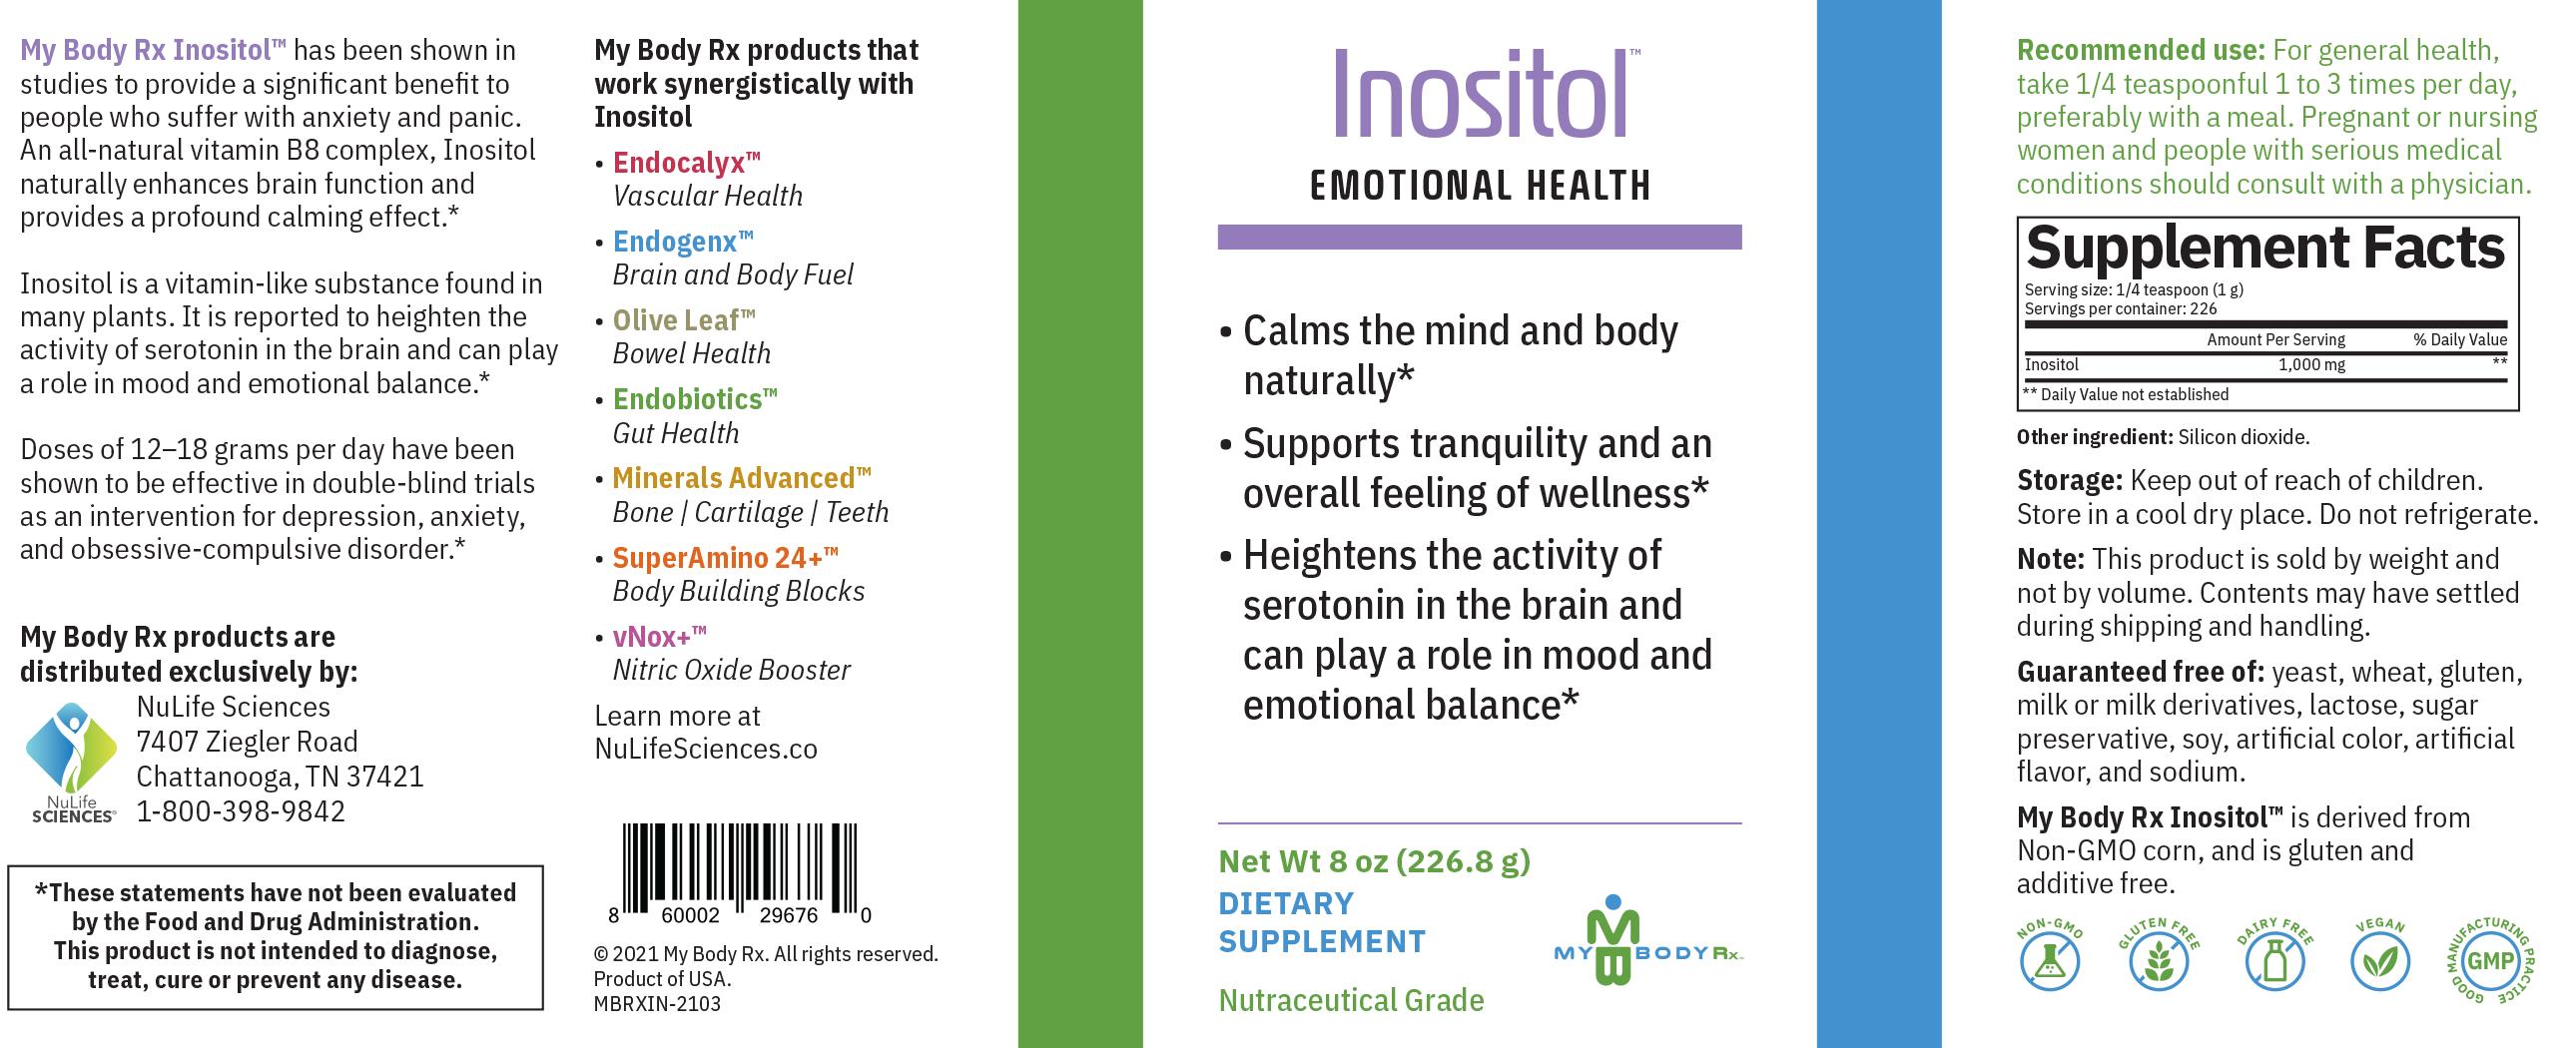 Inositol - Emotional Health Supplement